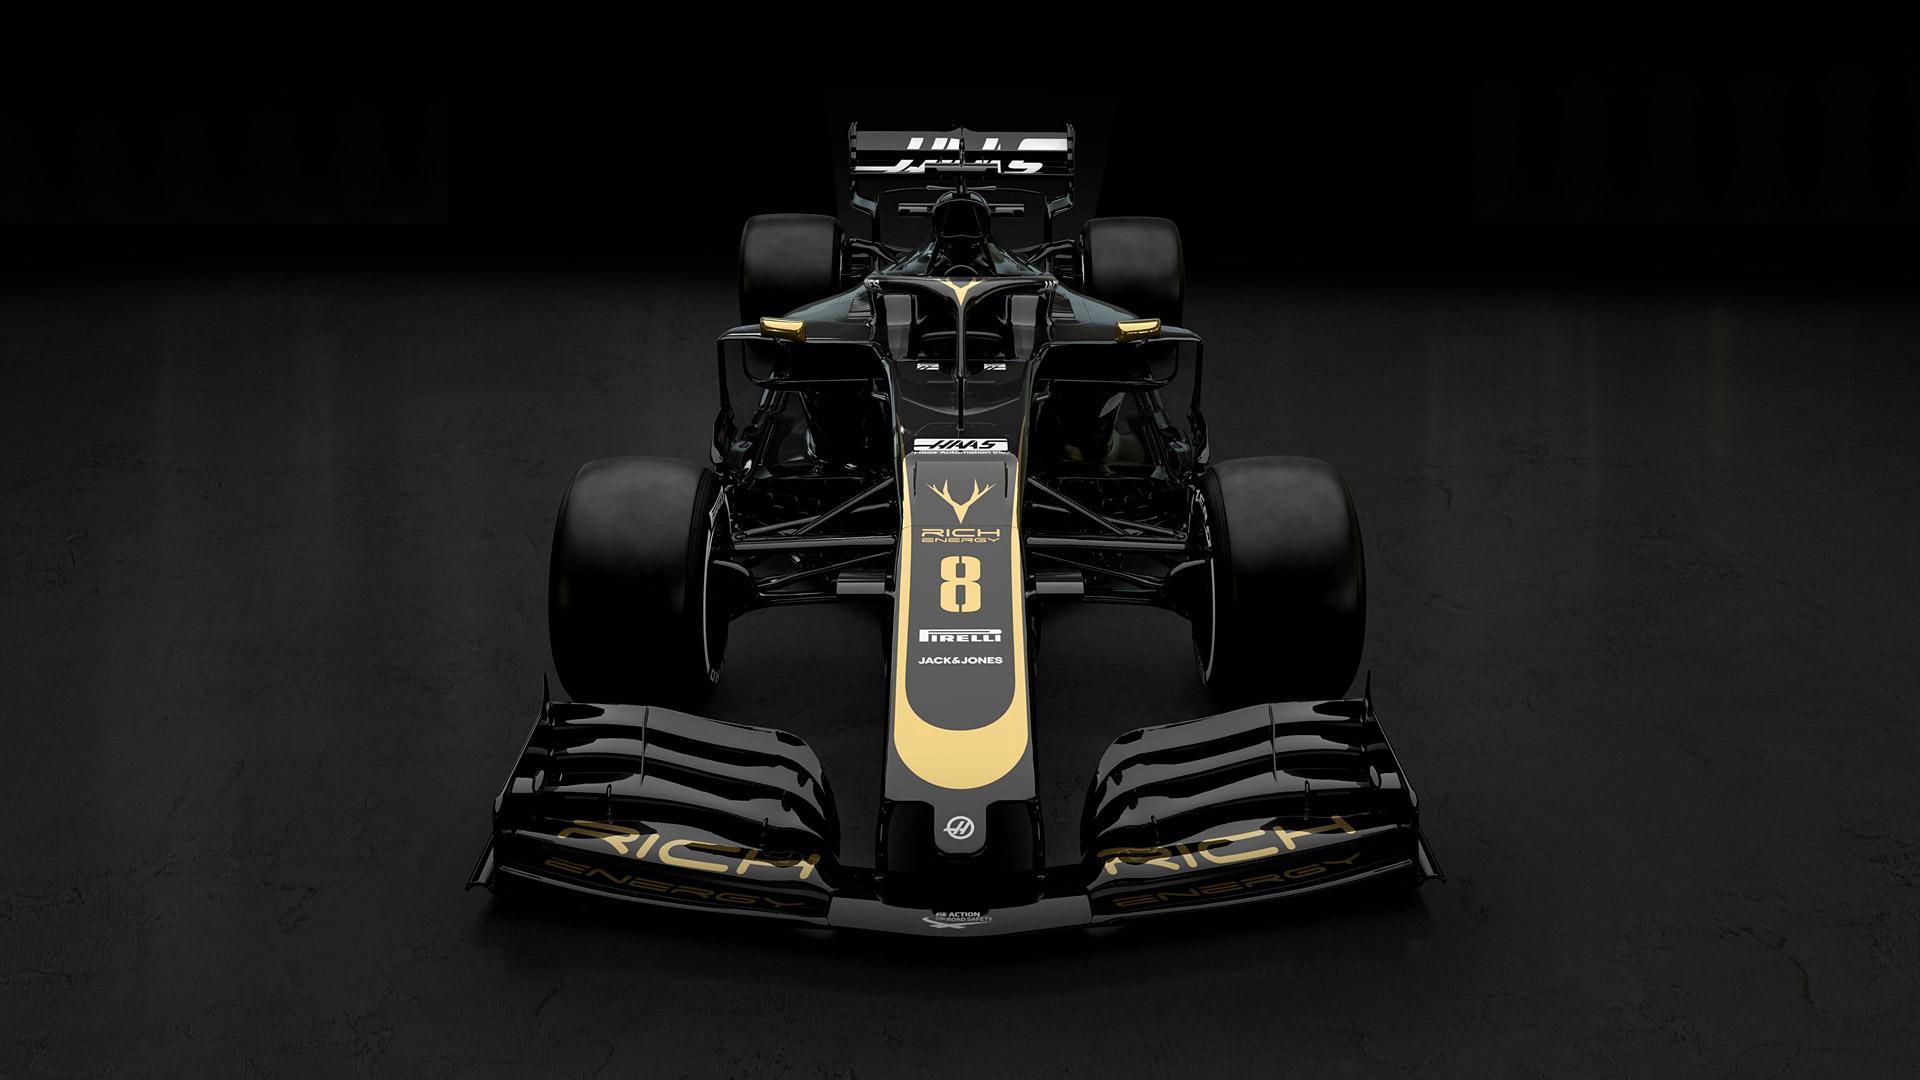 Haas F1 Teams Background 4